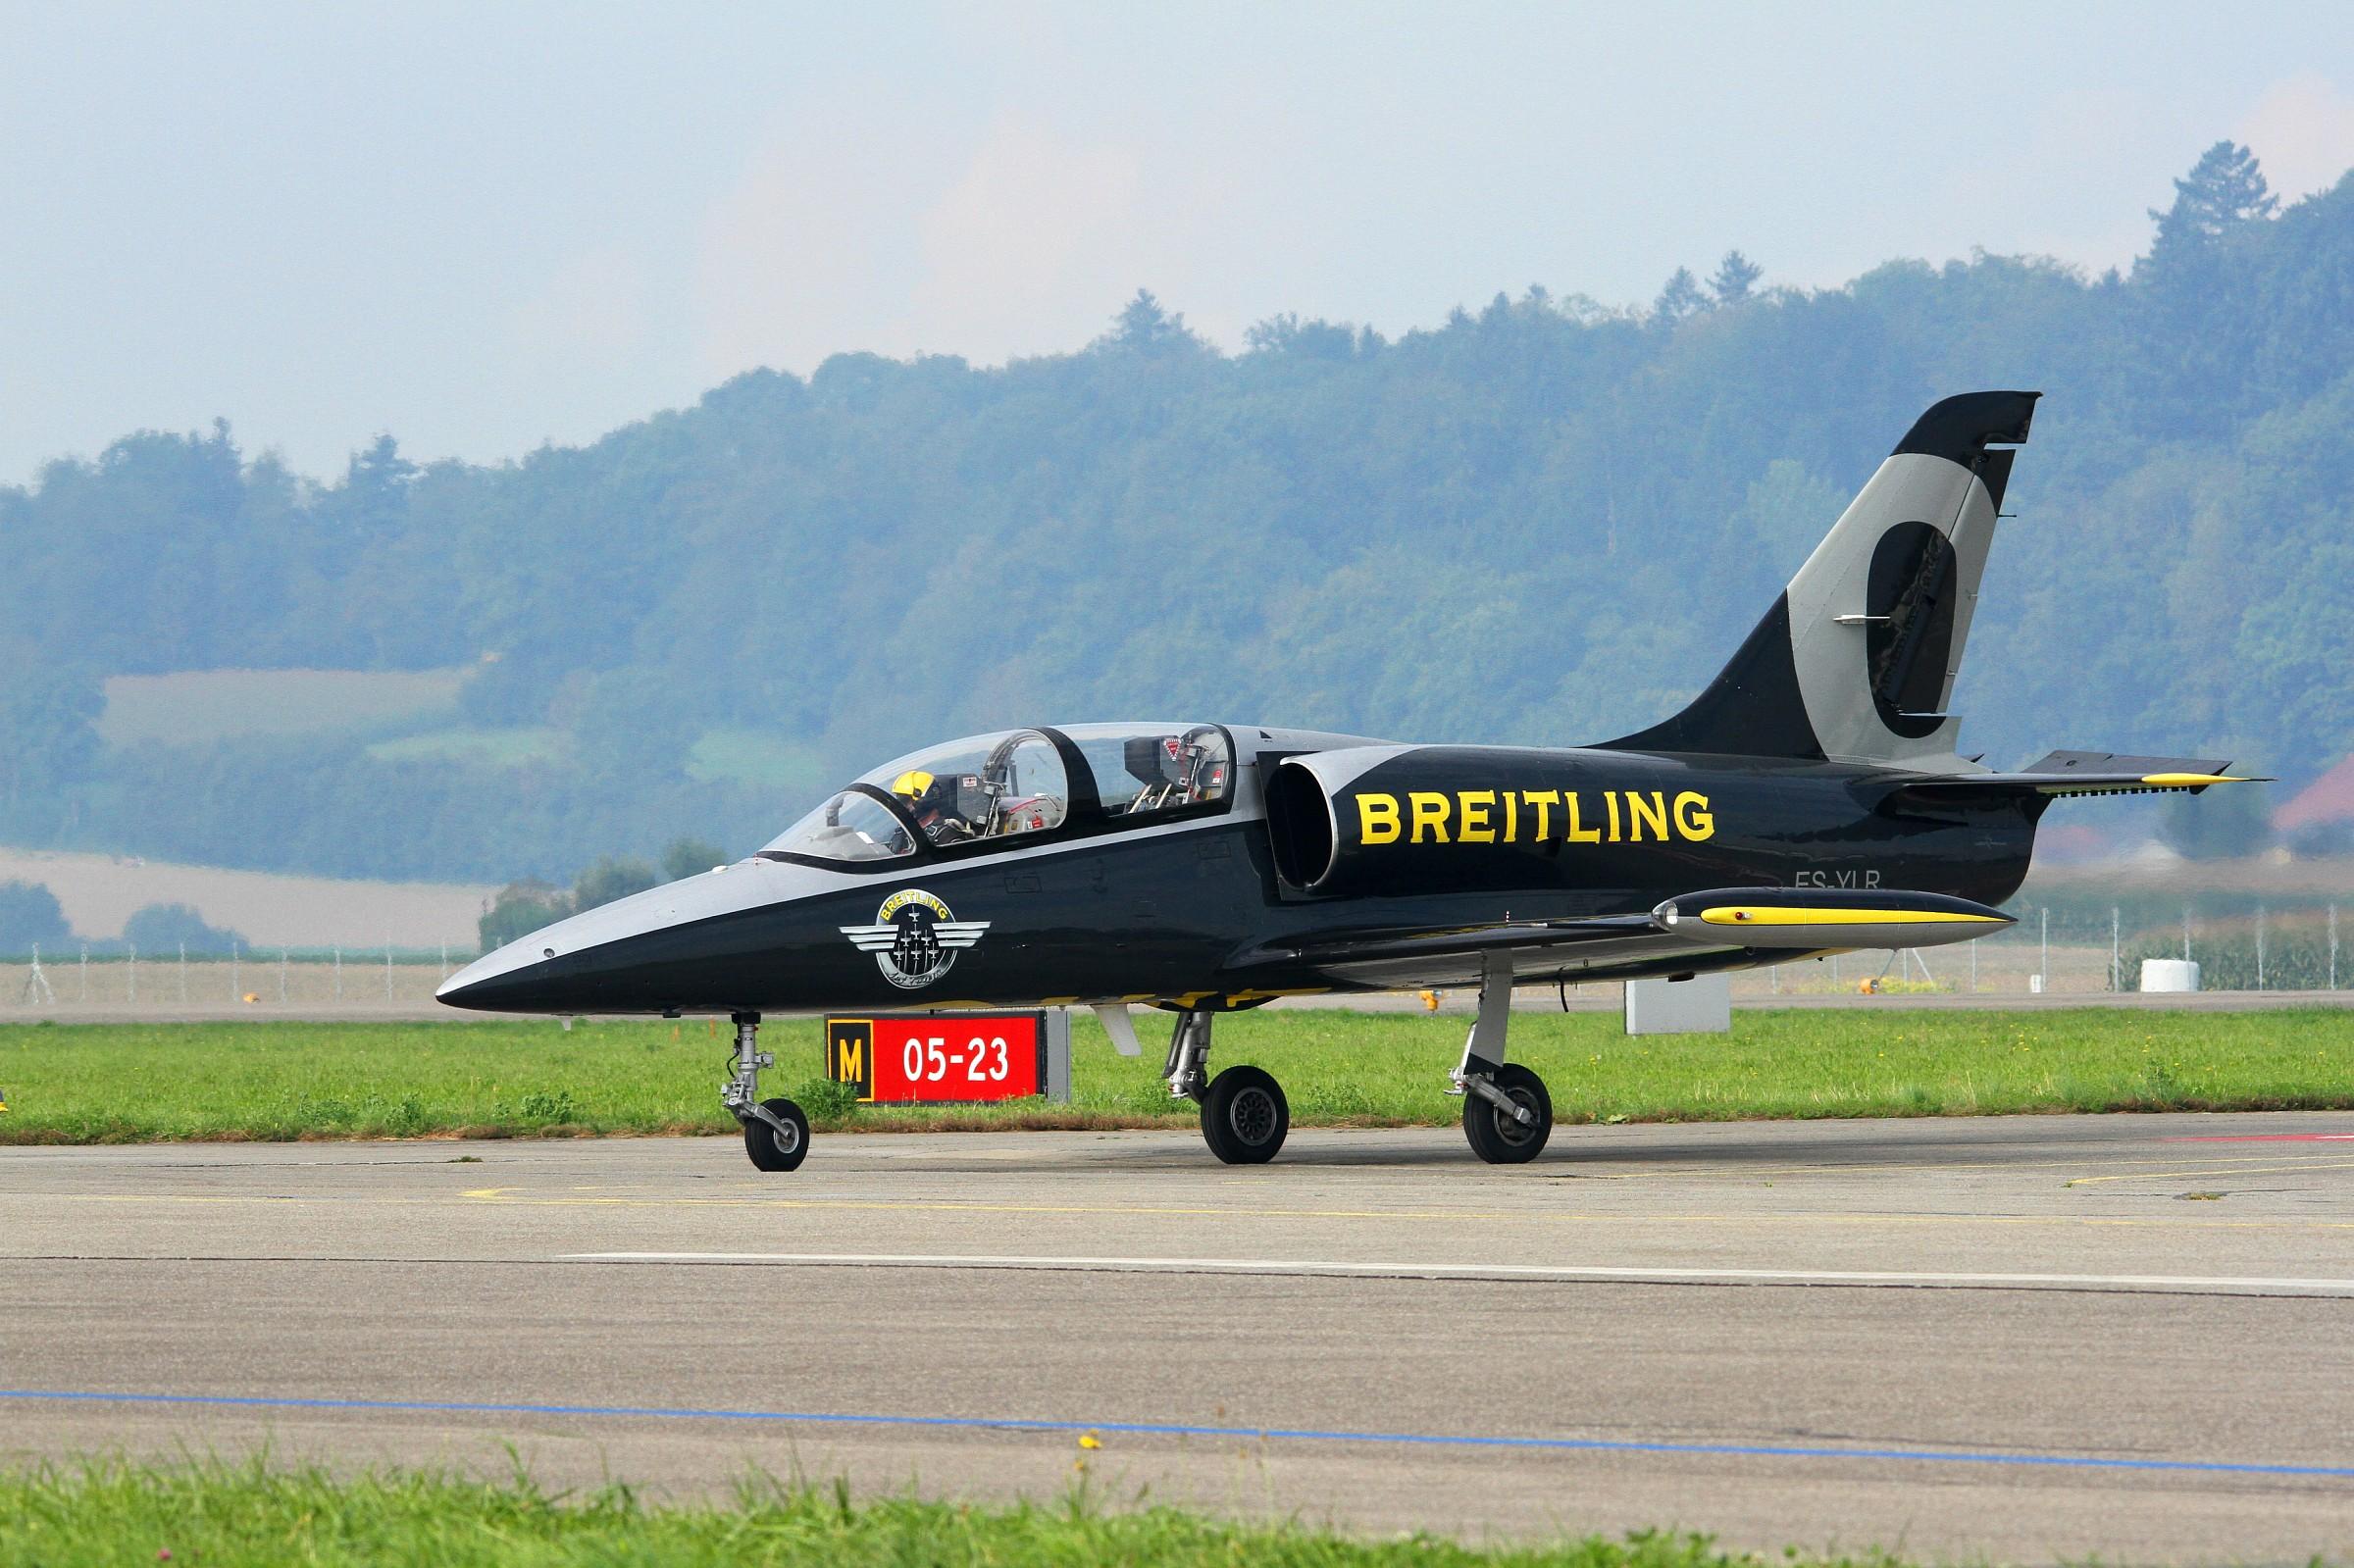 L39 - Breitling team...